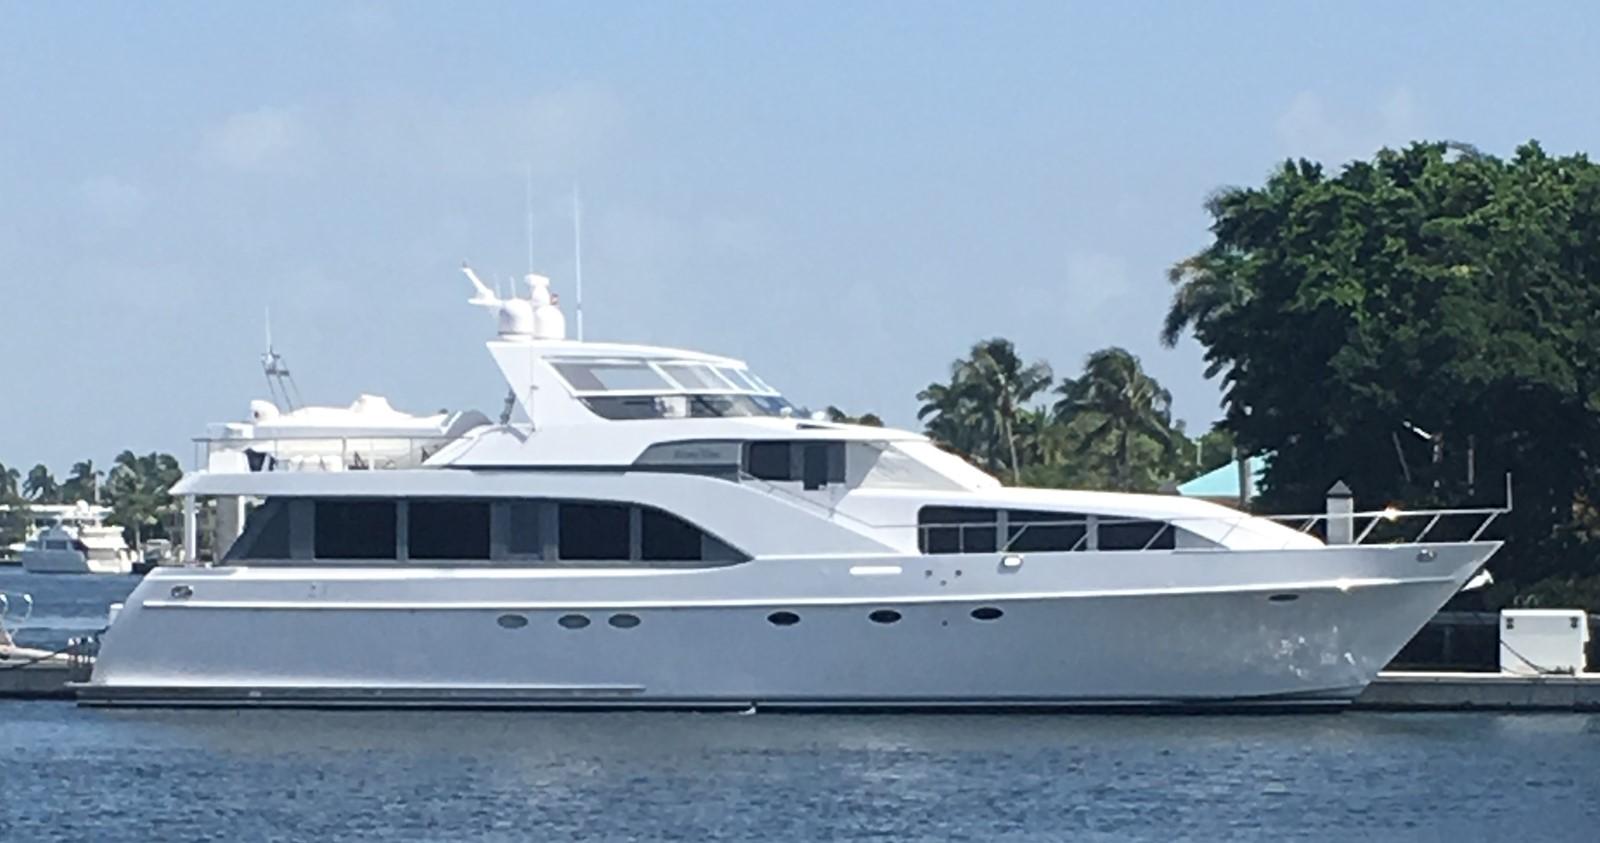 2000 NORDLUND 88 RPH Motoryacht For Sale